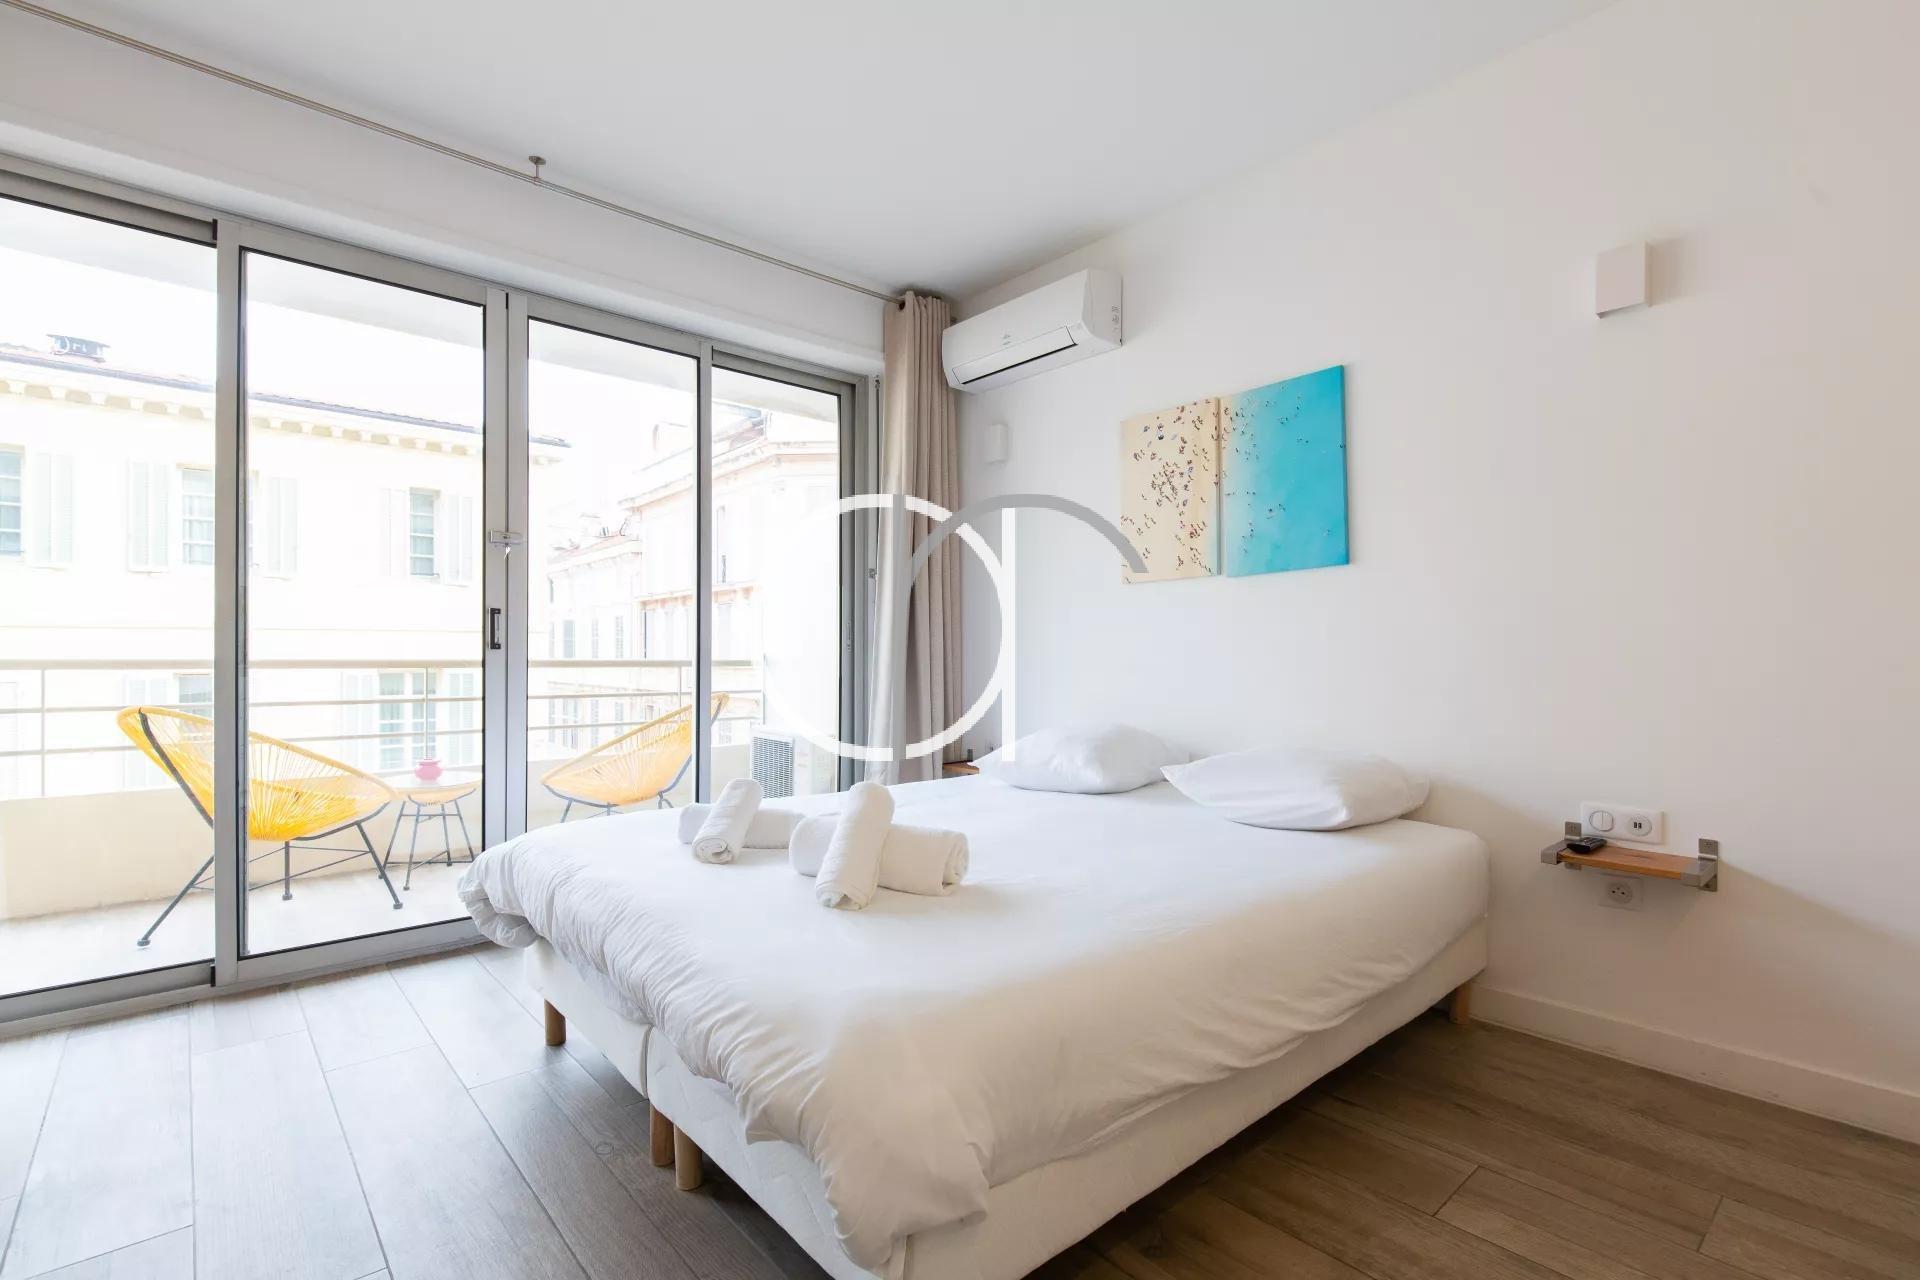 GRAND HOTEL - STUDIO AVEC TERRASSE